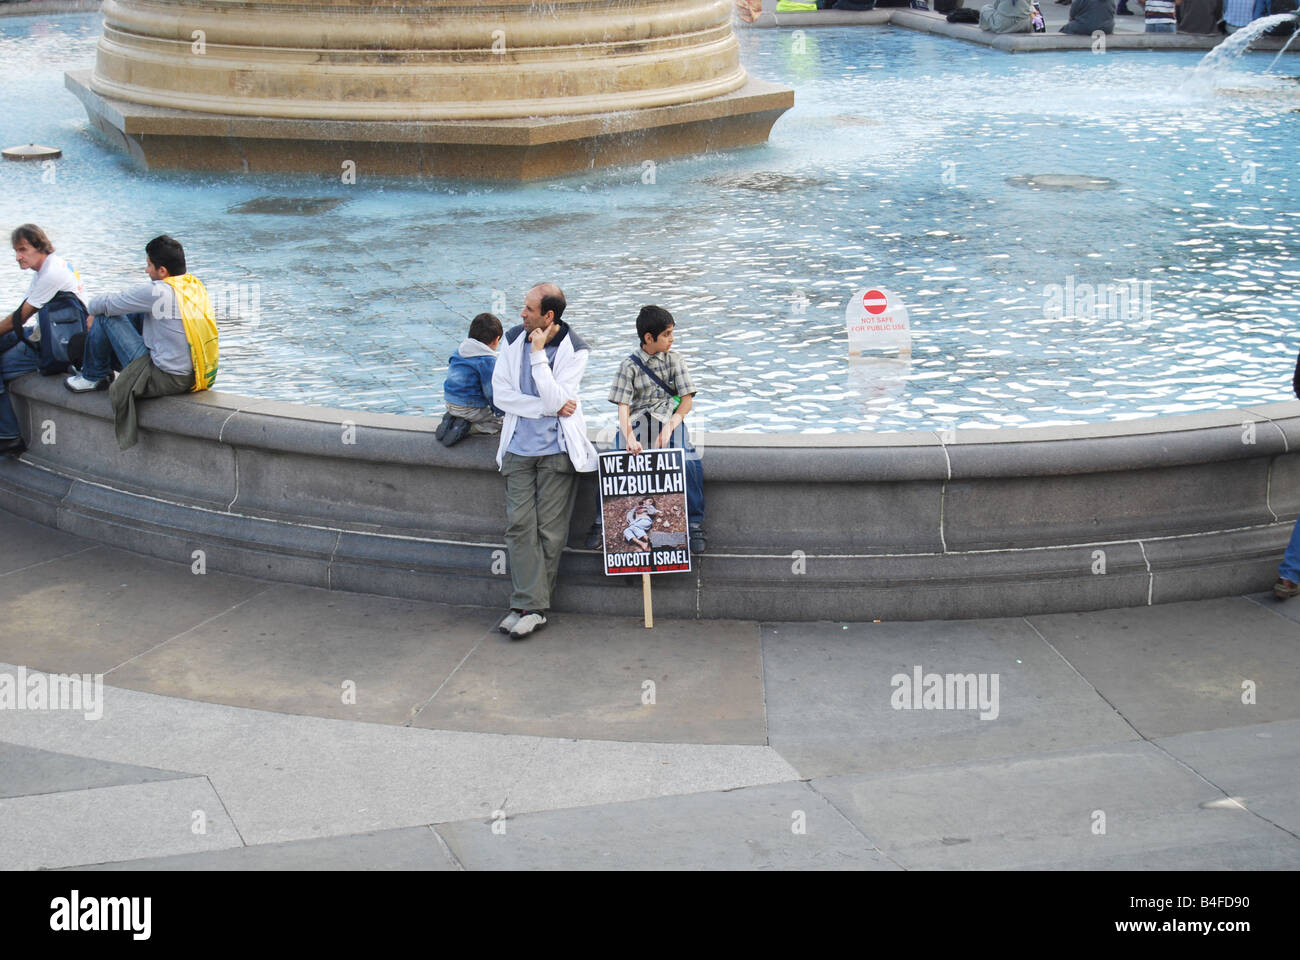 Hizbullah Trafalgar square Al Quds day - Stock Image